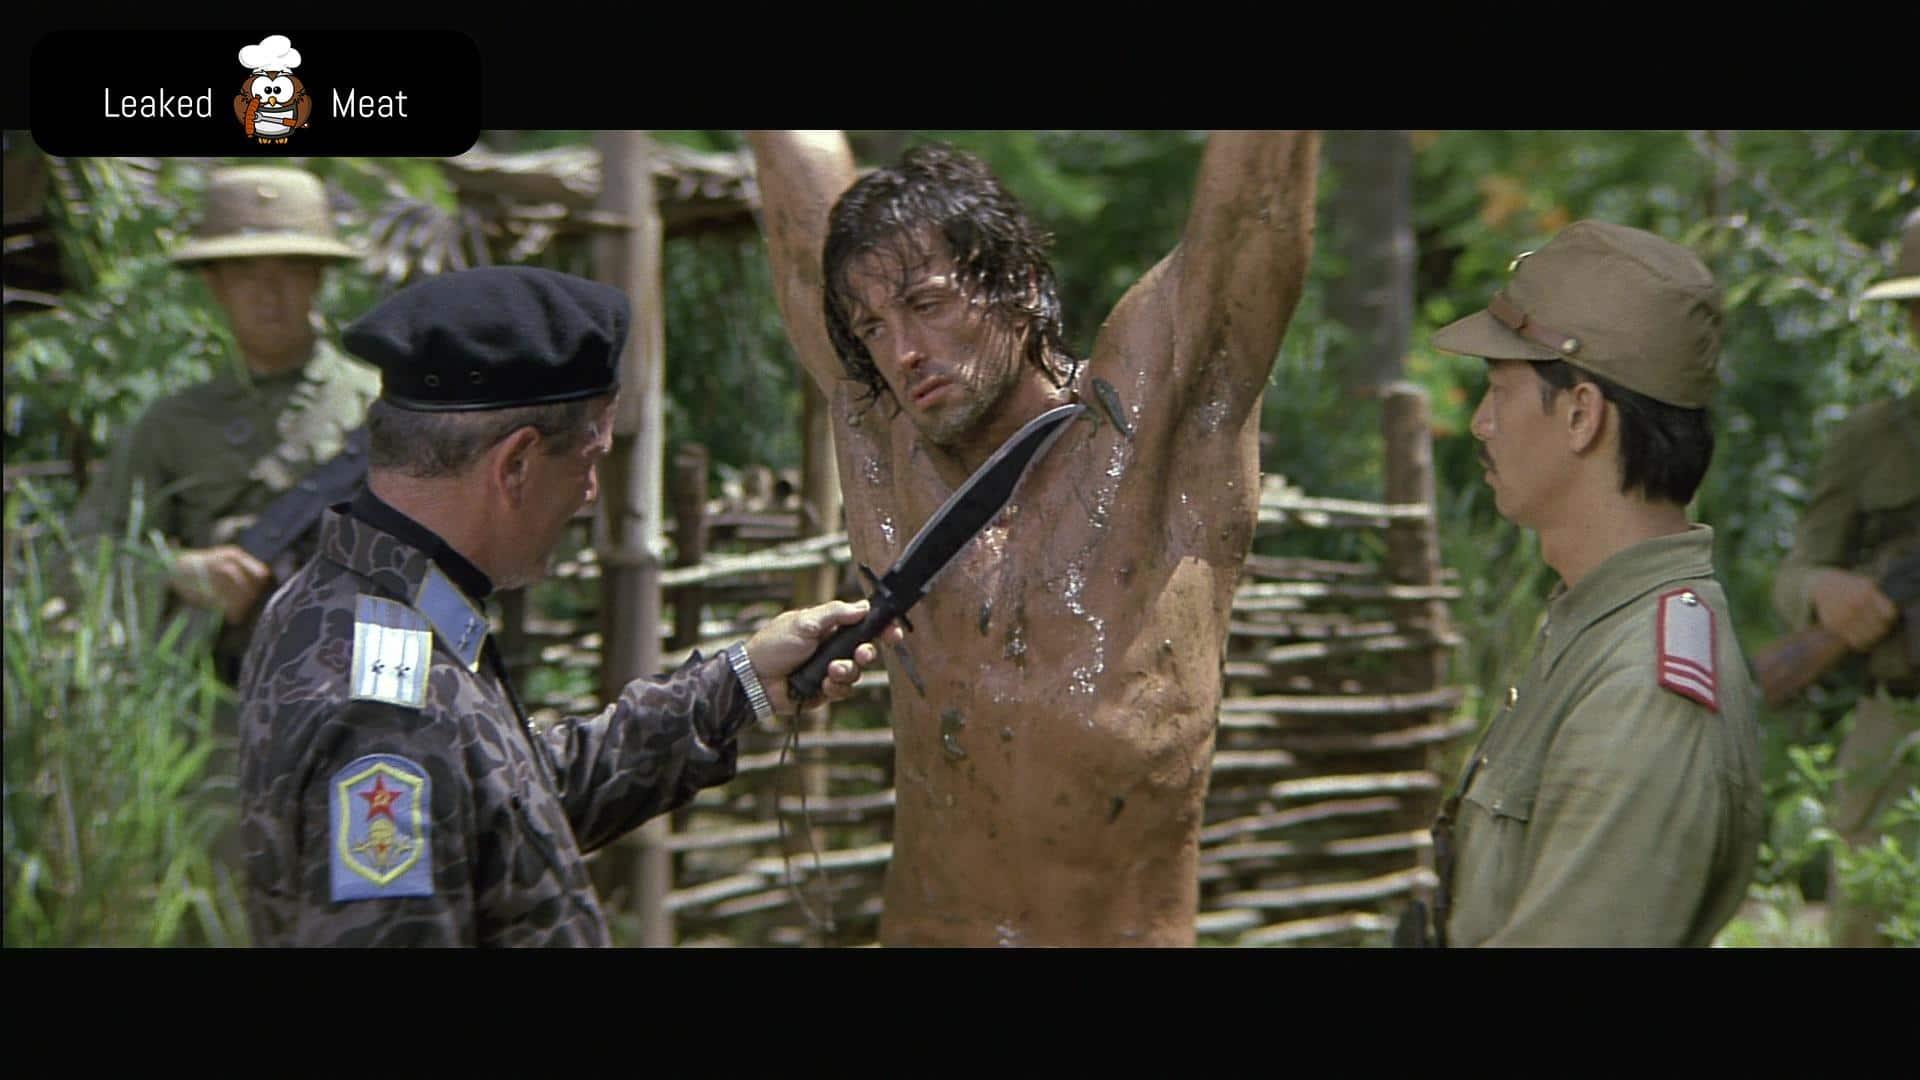 Sylvester Stallone | LeakedMeat 45